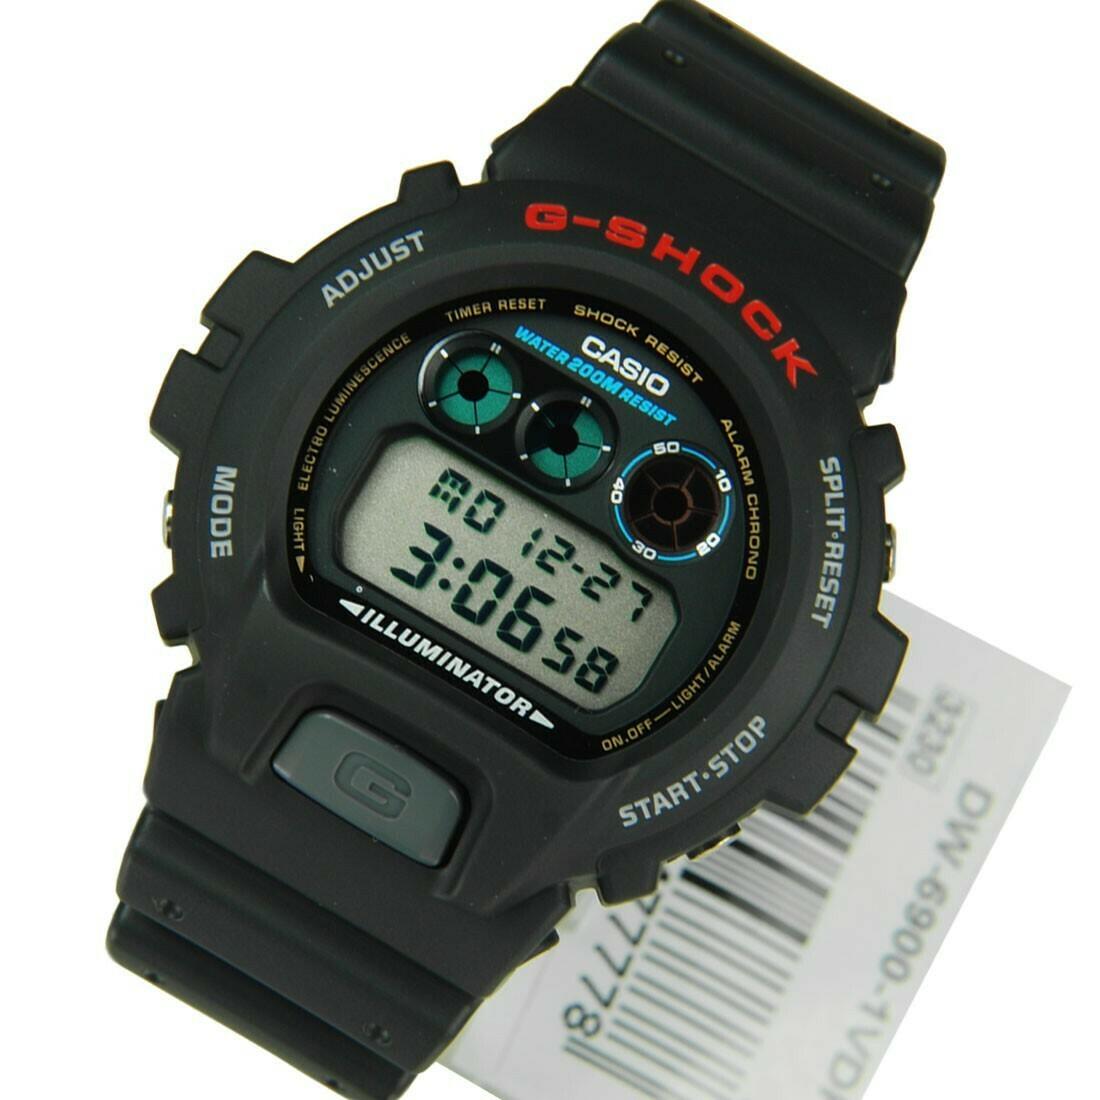 Reloj hombre Casio g-shock dw-6900-1v cronografo multifuncion - antigolpes